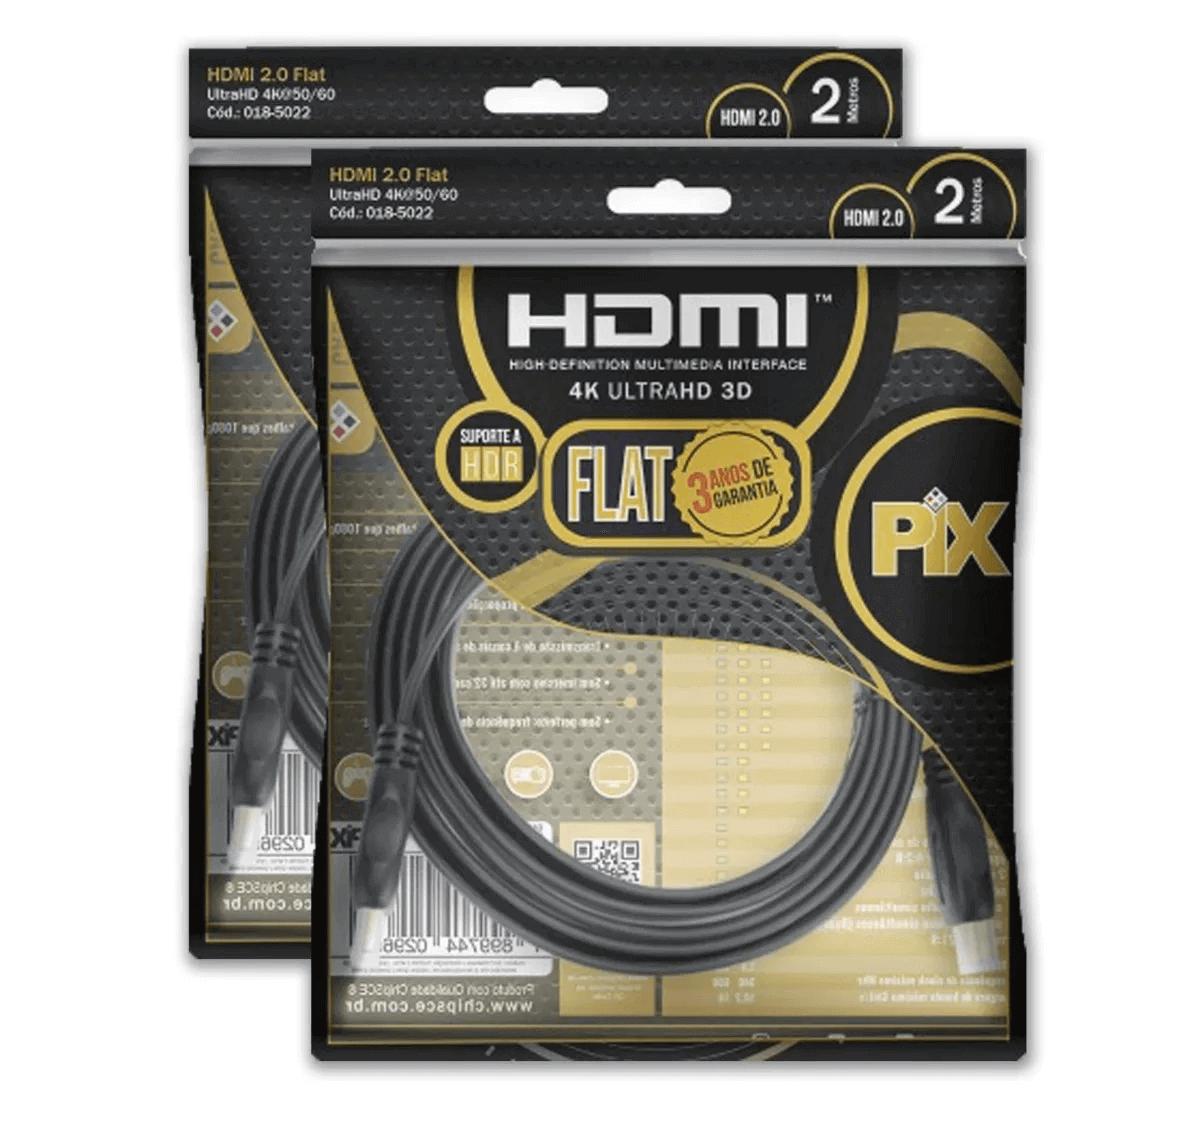 Kit 2 Cabo Hdmi Flat 2.0 Pix 19 Pinos 4k Ultrahd 3d Hdr 2 M